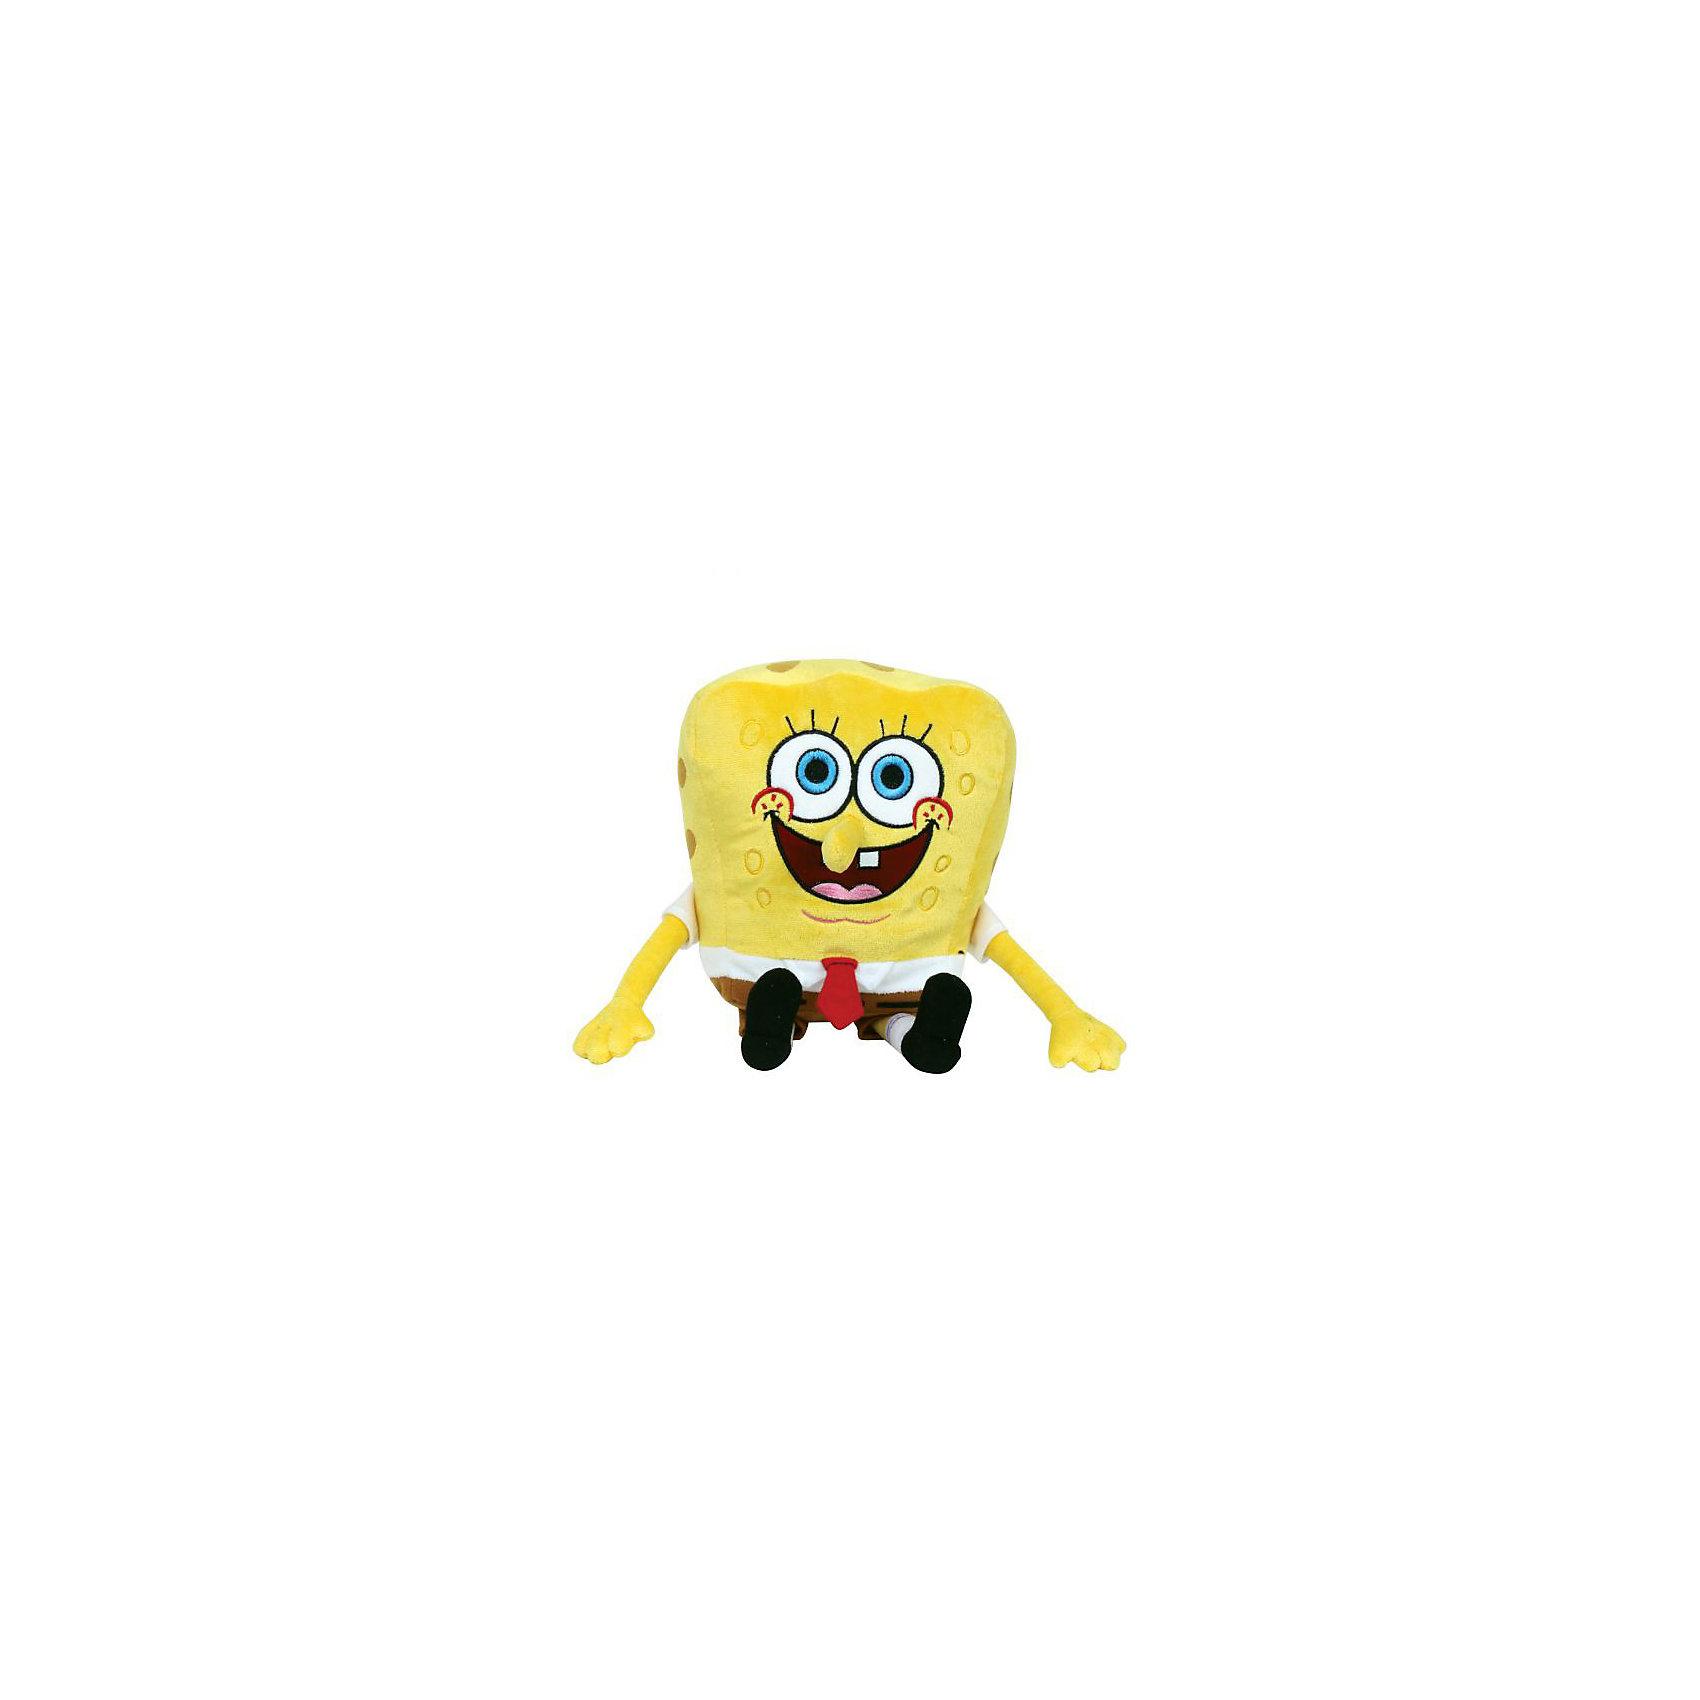 МУЛЬТИ-ПУЛЬТИ Мягкая игрушка Губка Боб, МУЛЬТИ-ПУЛЬТИ мульти пульти мягкая игрушка заяц топотун со звуком disney мульти пульти